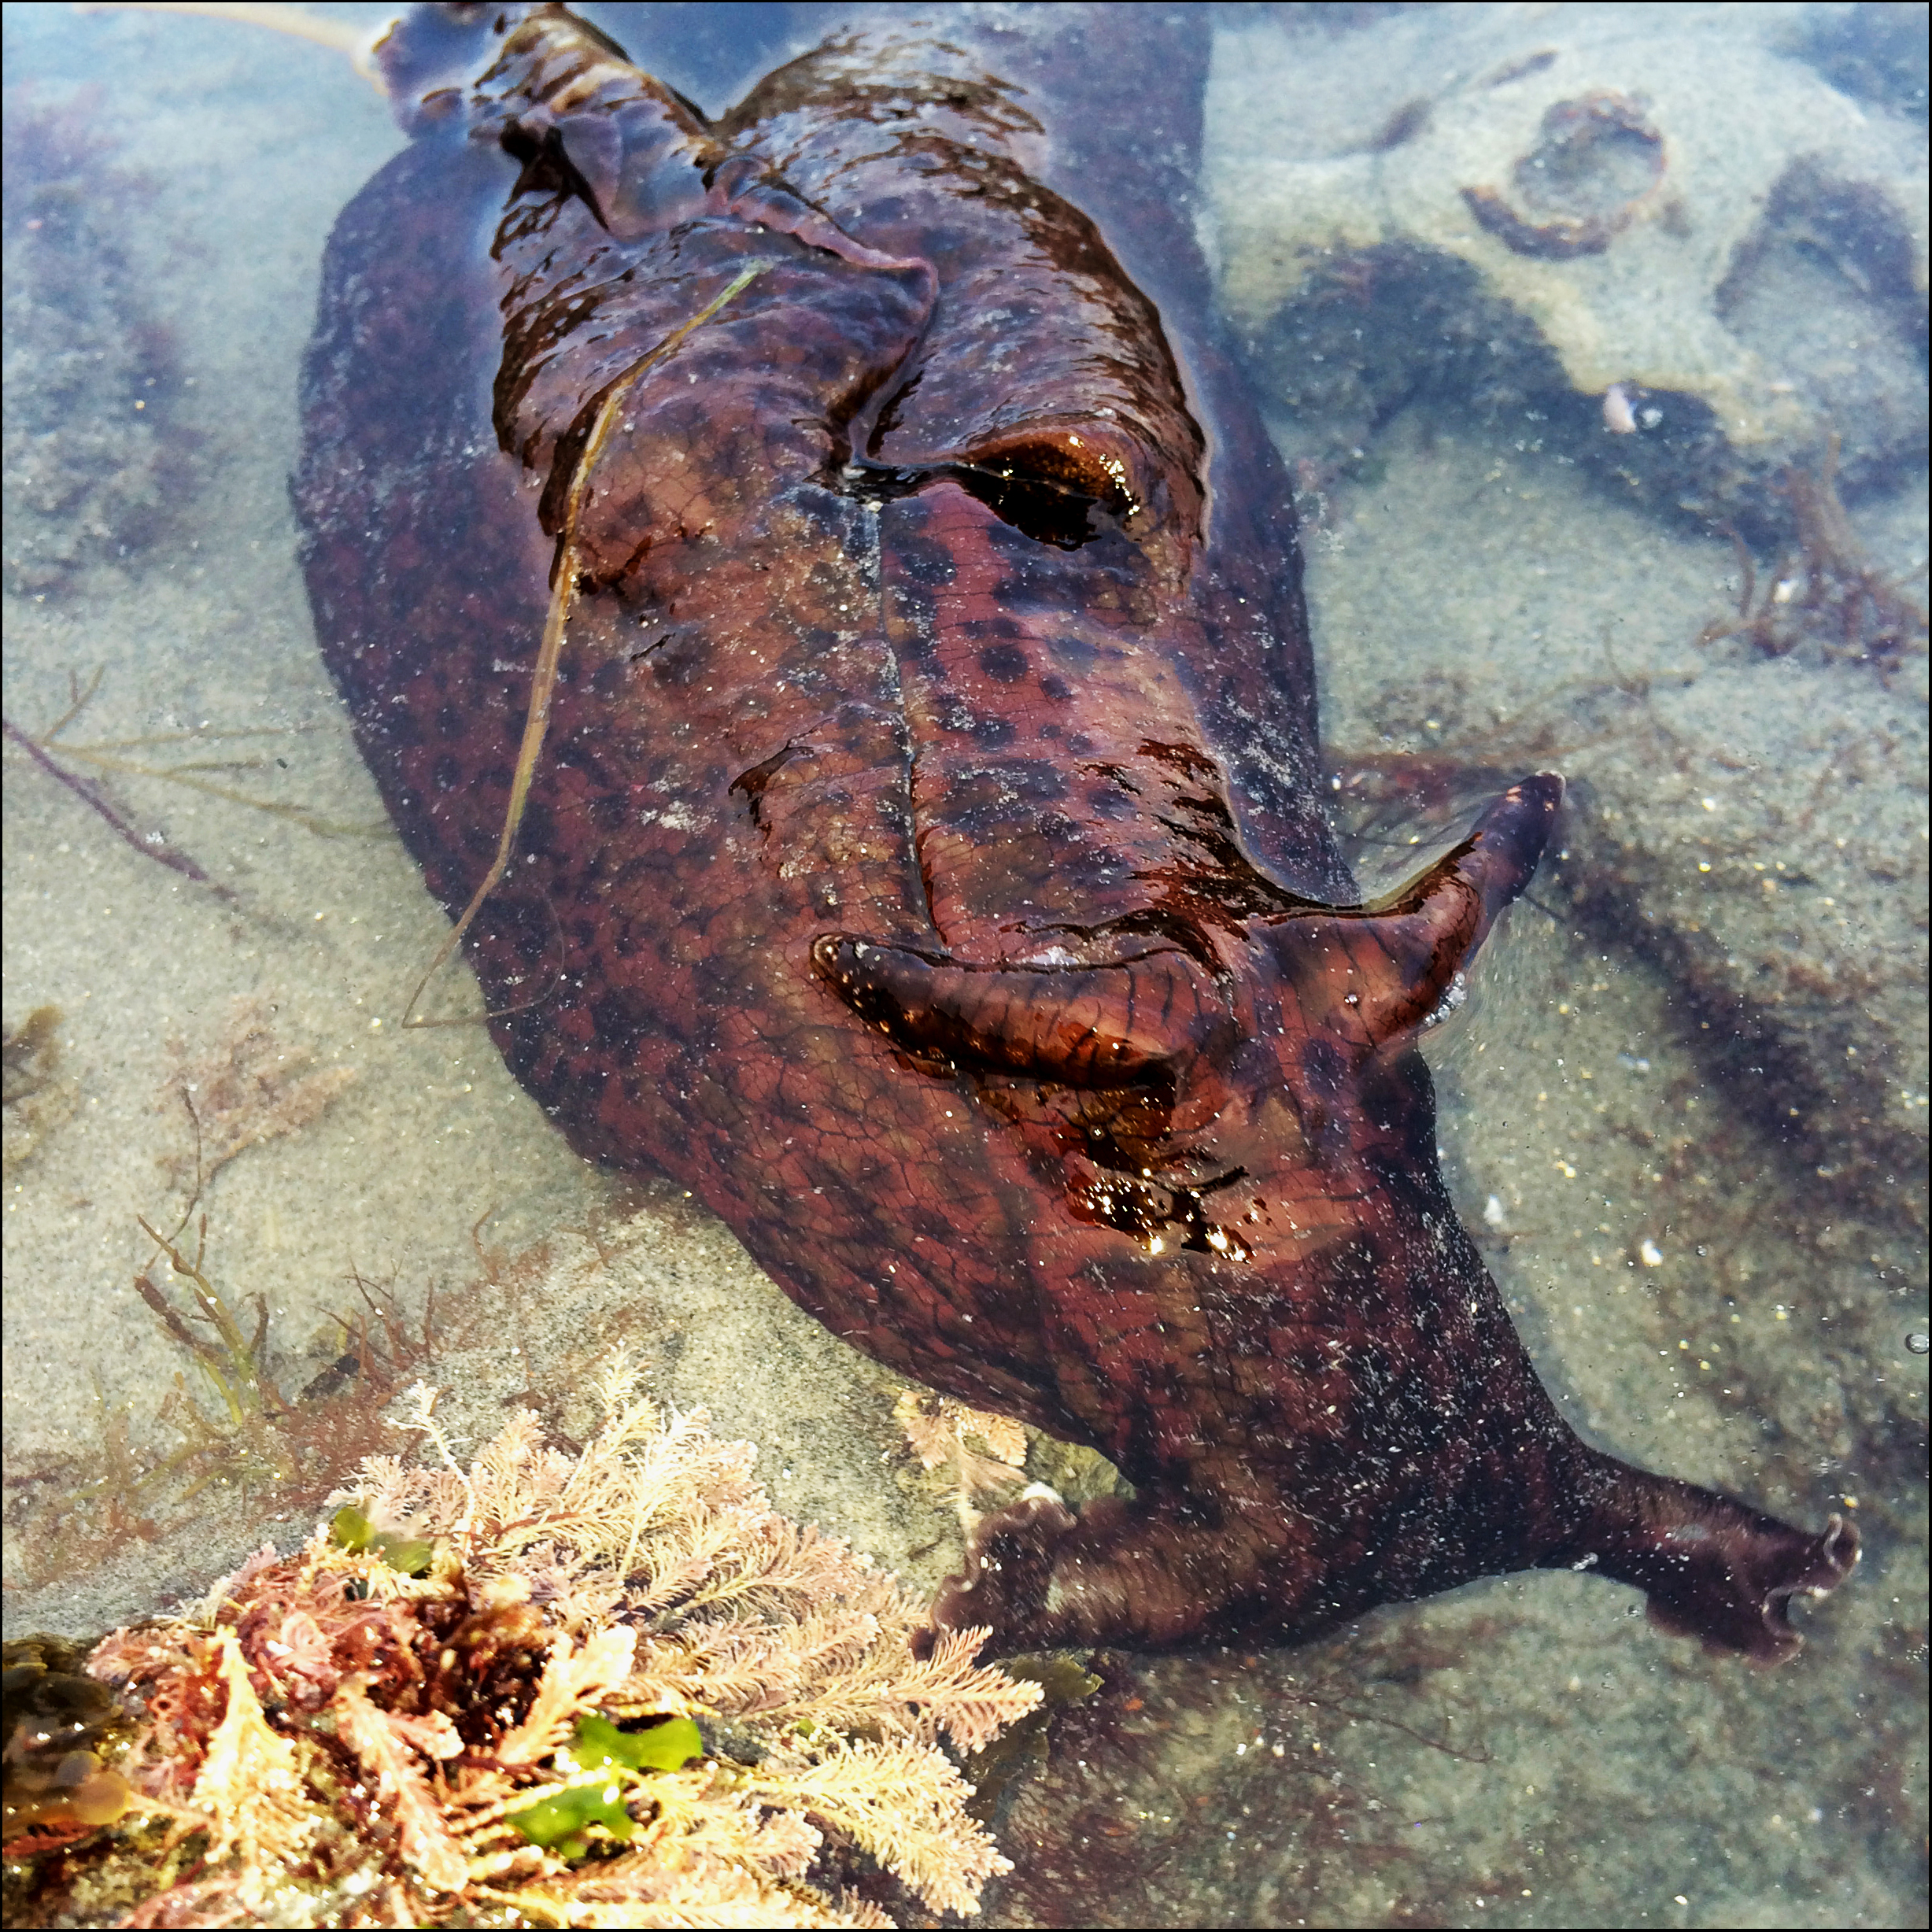 Garbage Dumps in Ocean Dumped Into Our Oceans